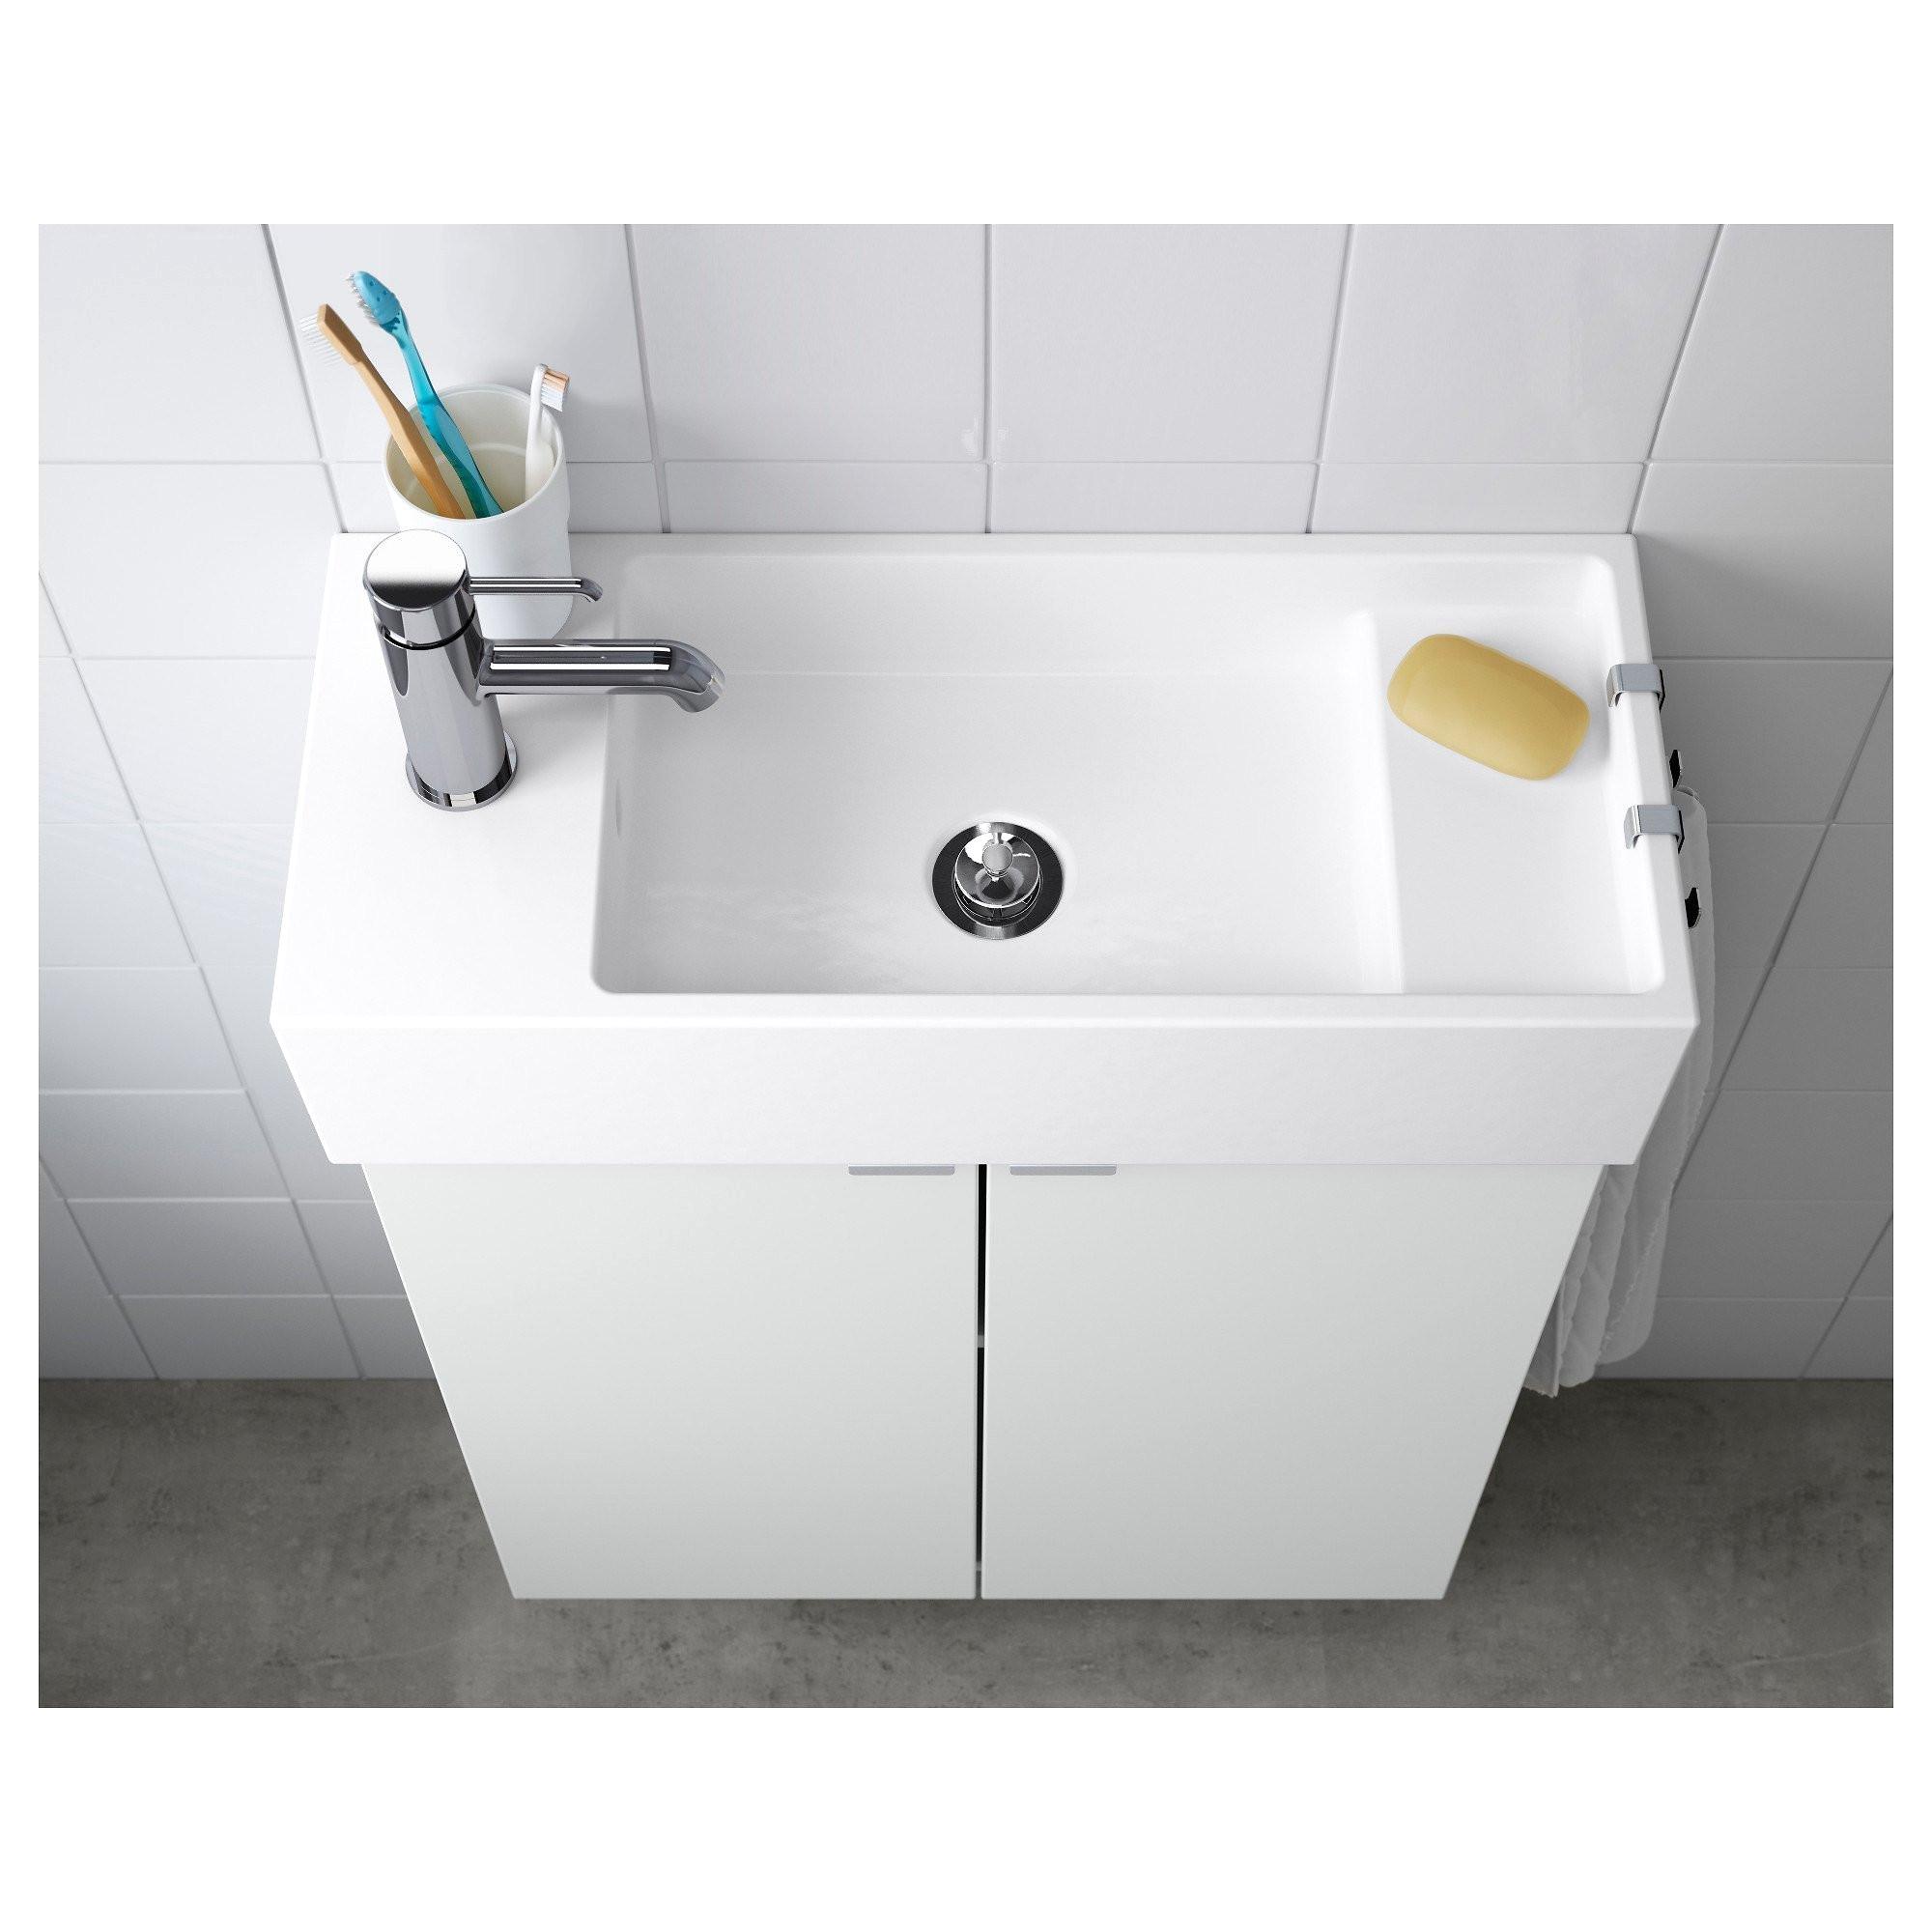 shower reglazing awesome bathroom tile refinishing pany best unique bathroom decorating